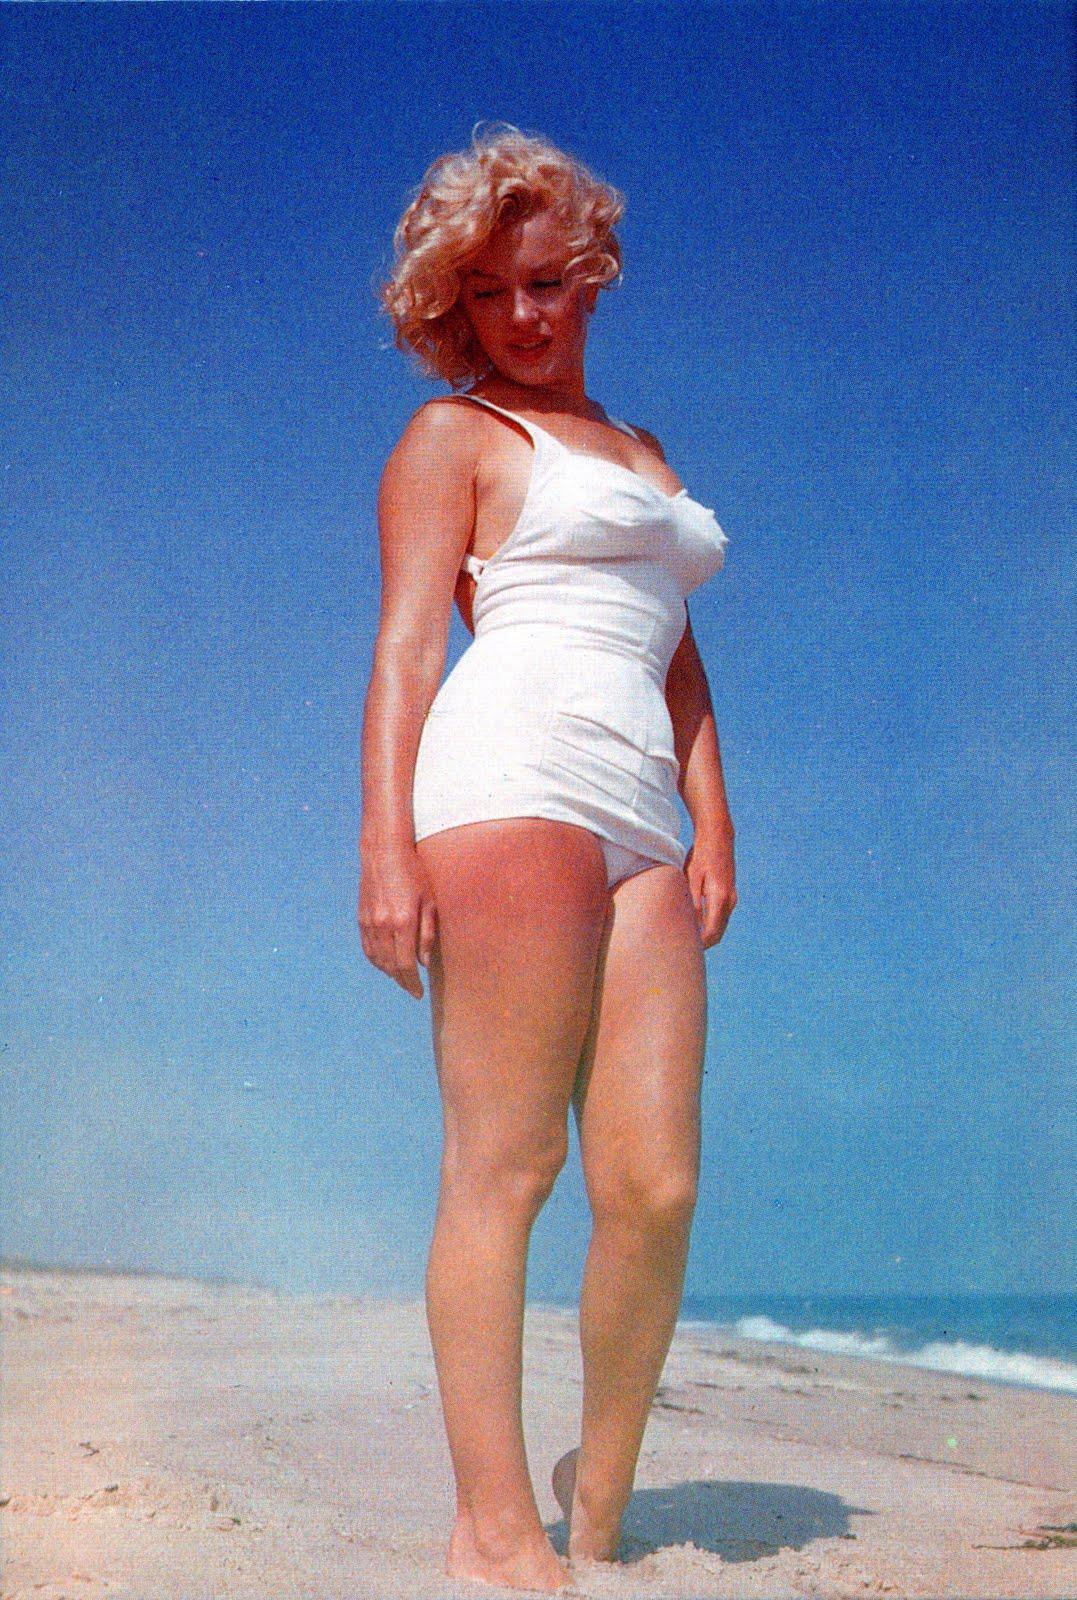 Daily Lazy Marilyn Monroe At The Beach